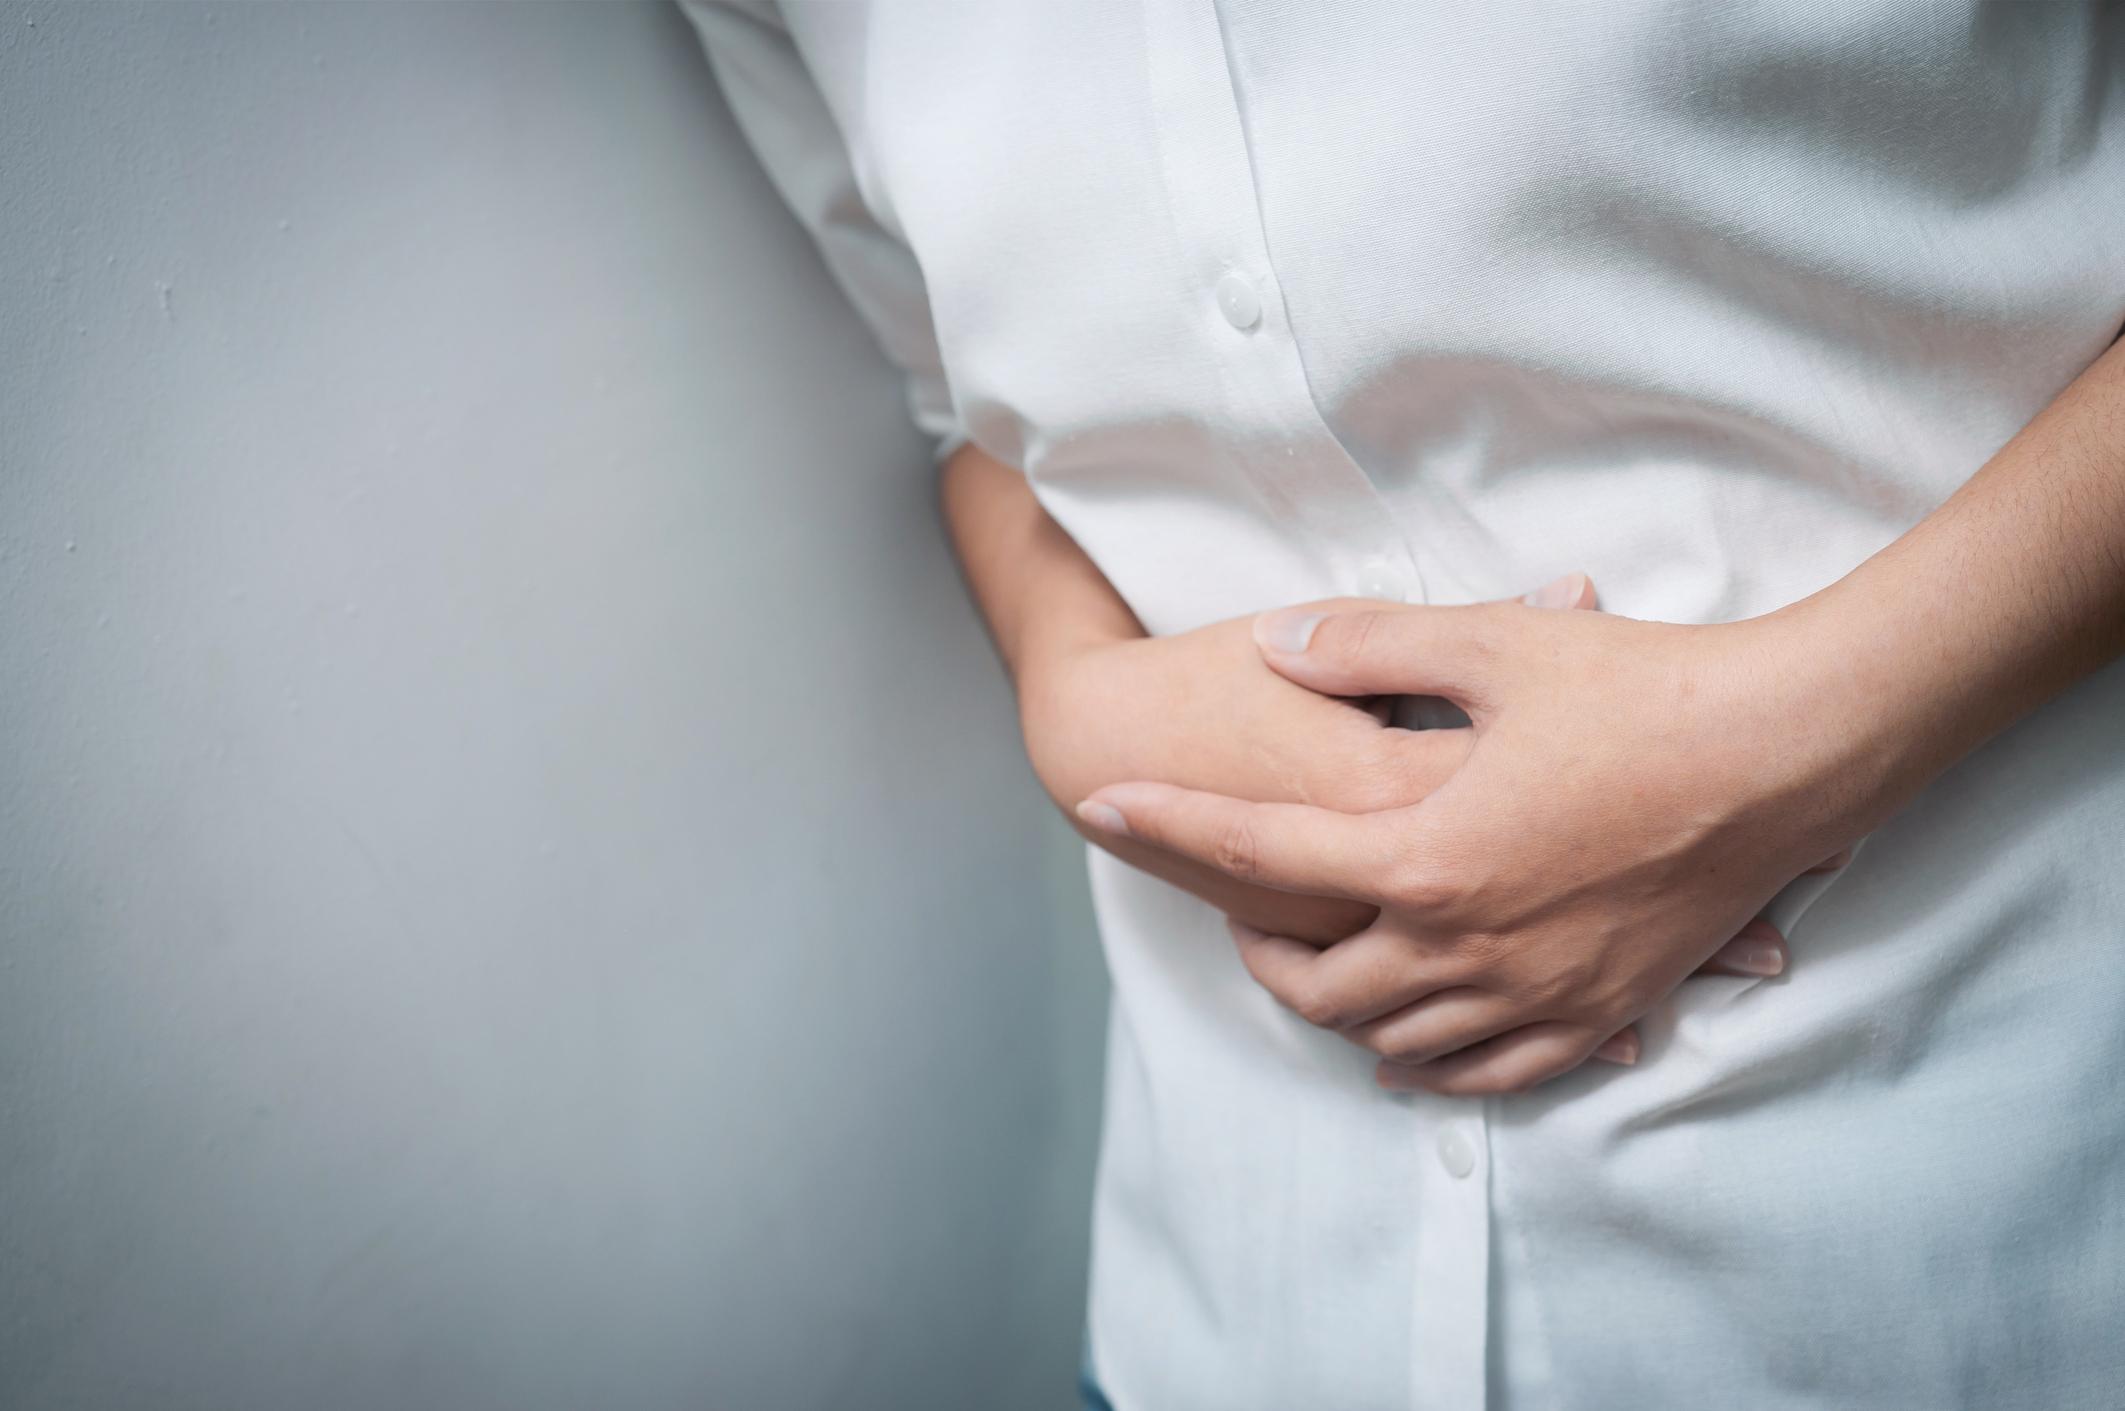 bladder spasms